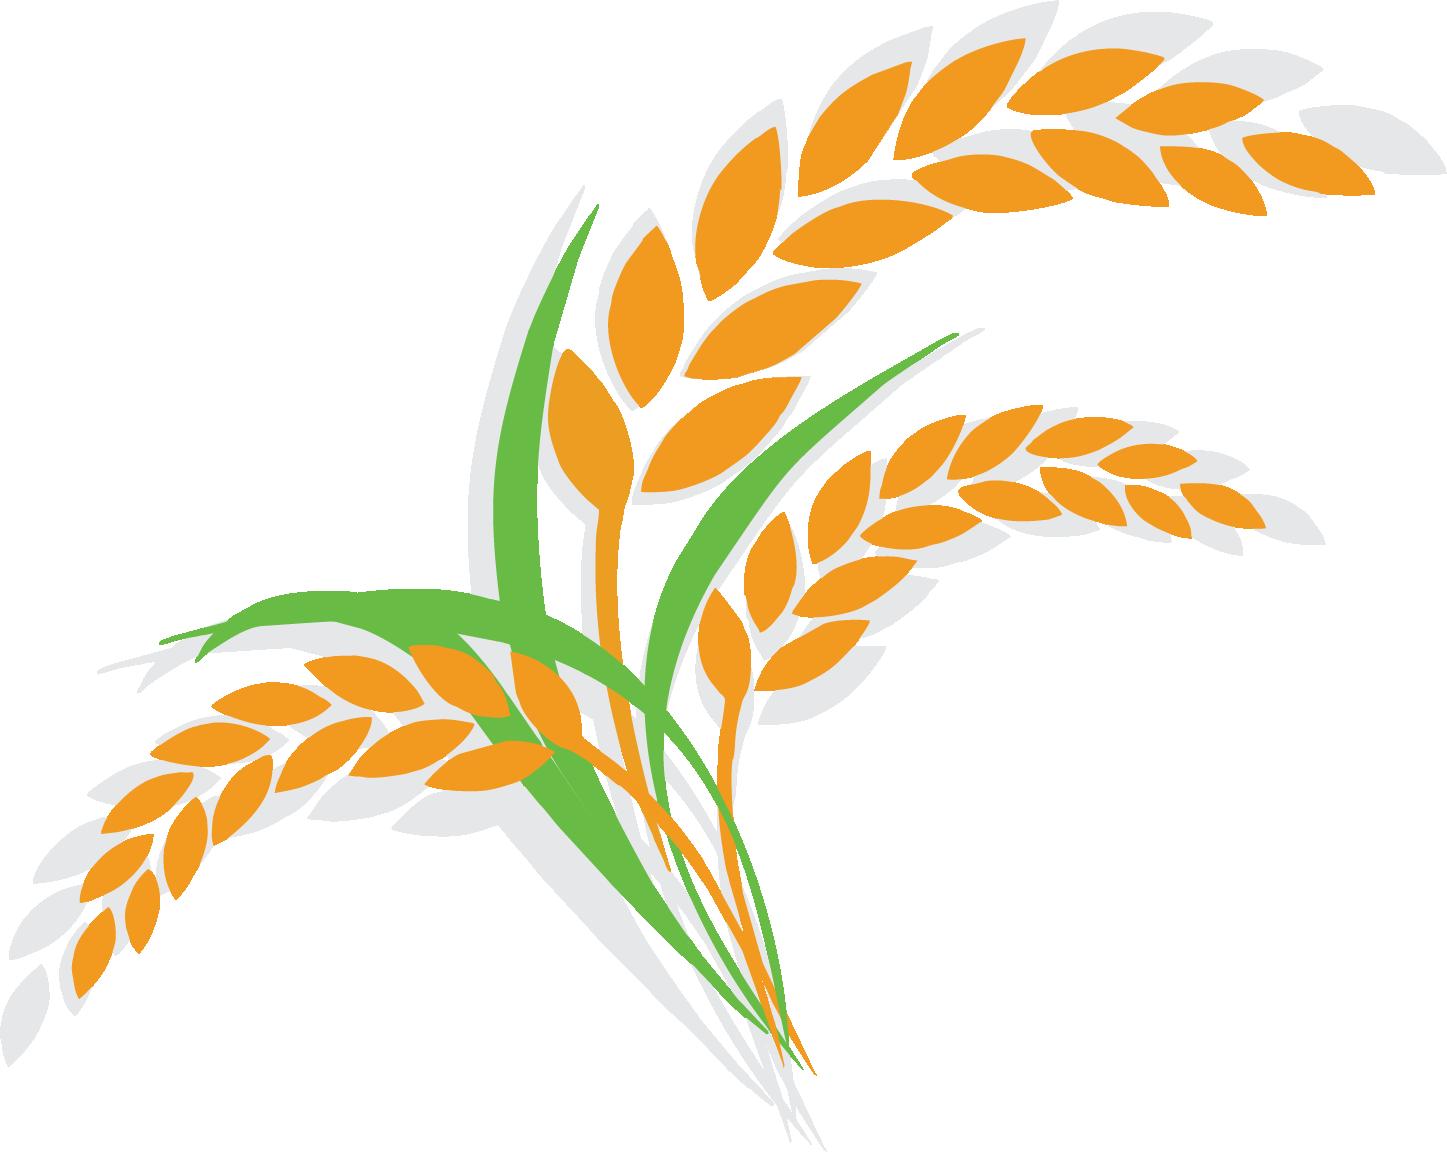 Rice clipart rice leaf. Oat wheat shutterstock illustration